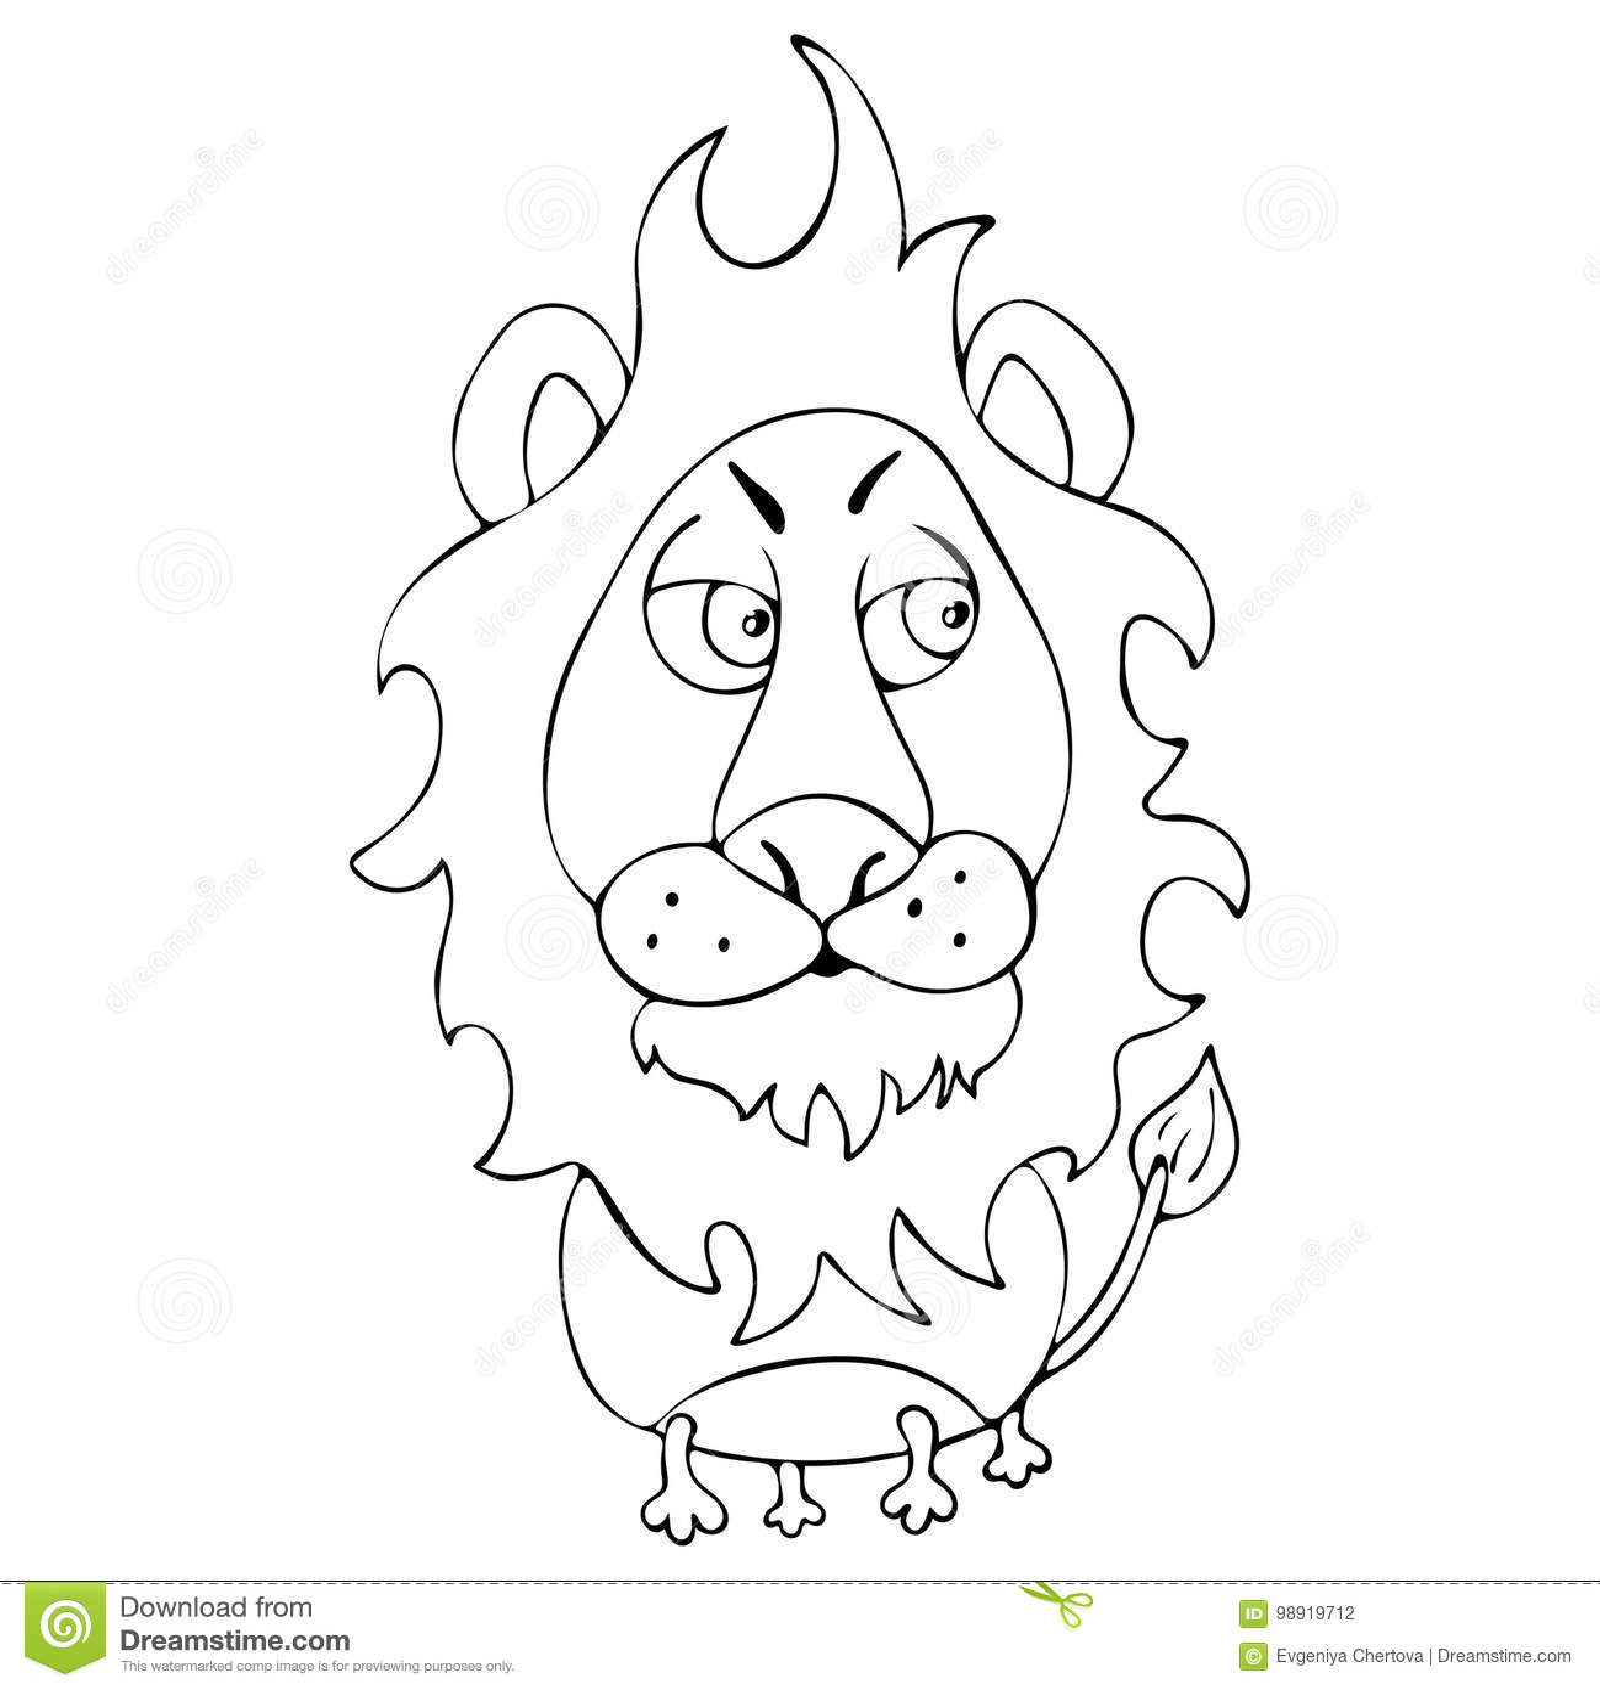 Asombroso Colorear Animales Realista León Cresta - Dibujos Para ...